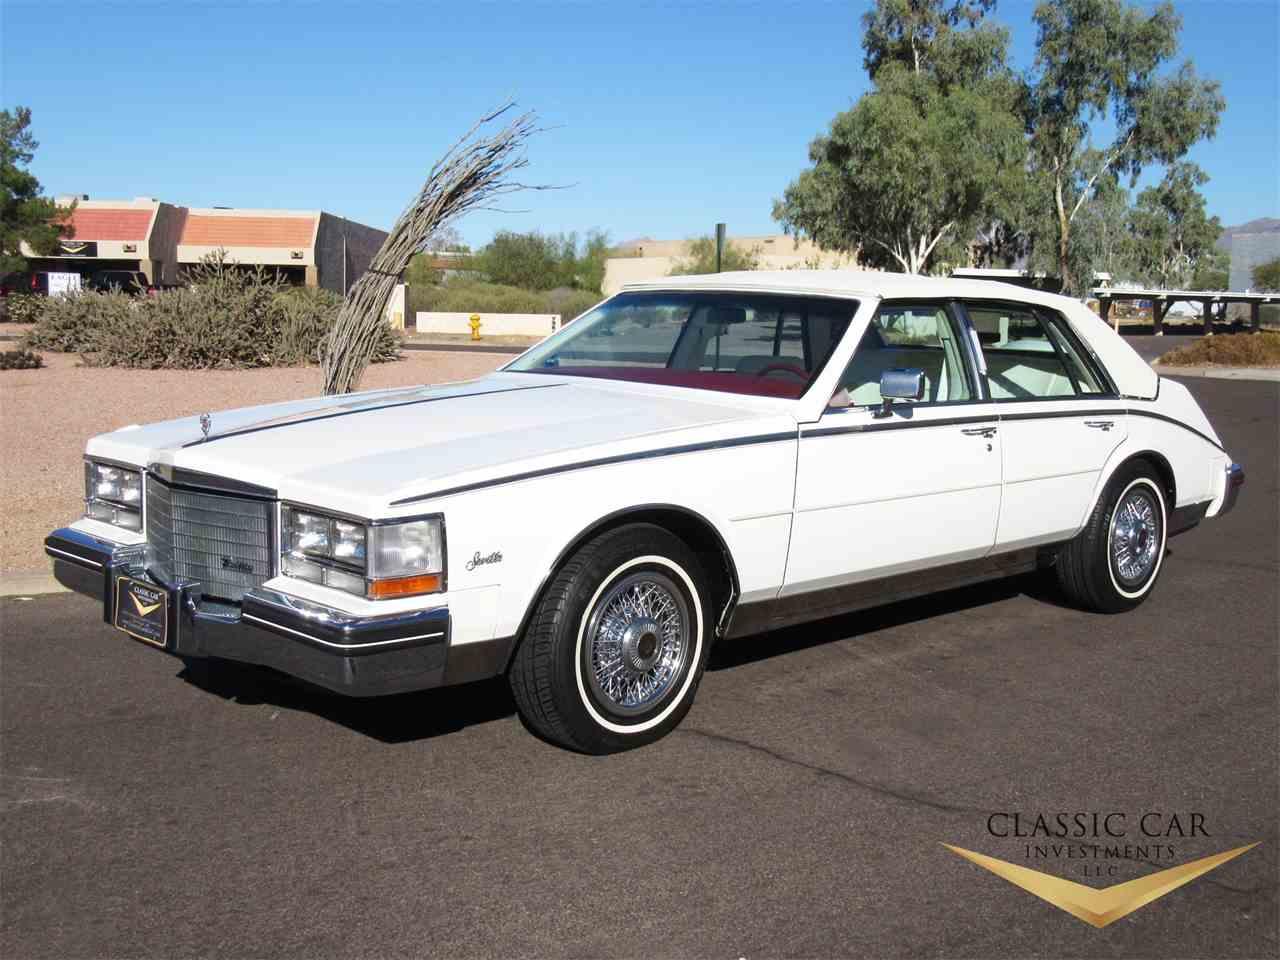 1985 Cadillac Seville for Sale | ClassicCars.com | CC-1048350 | 1280 x 960 jpeg 89kB